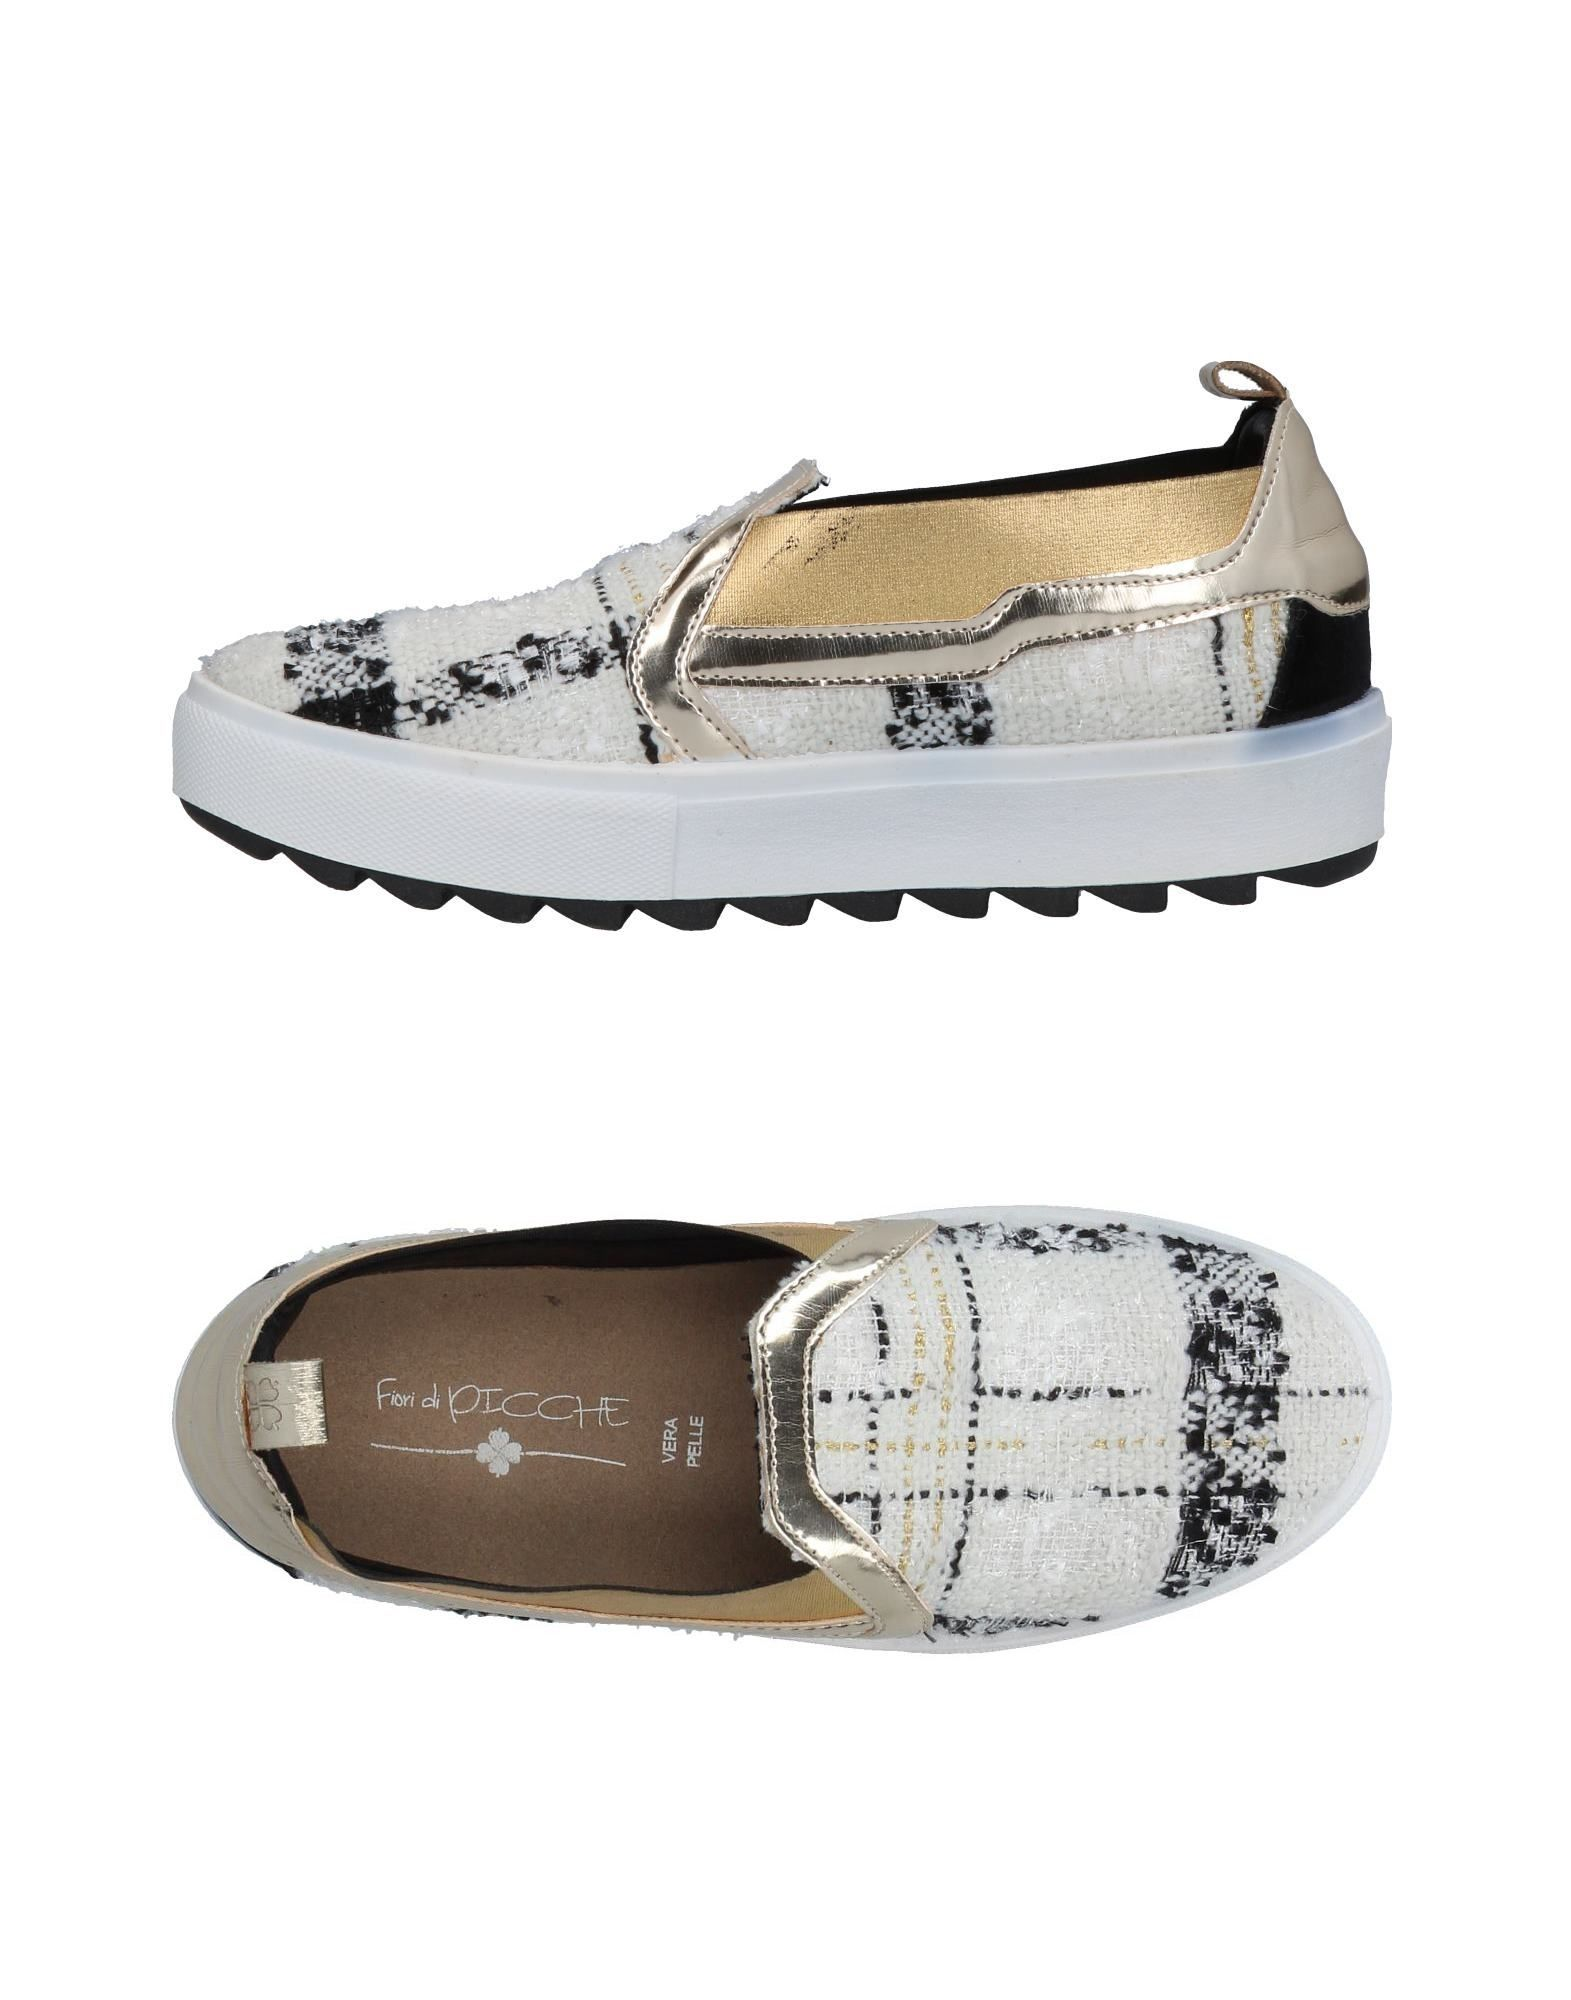 Sneakers Fiori Di Picche Femme - Sneakers Fiori Di Picche sur